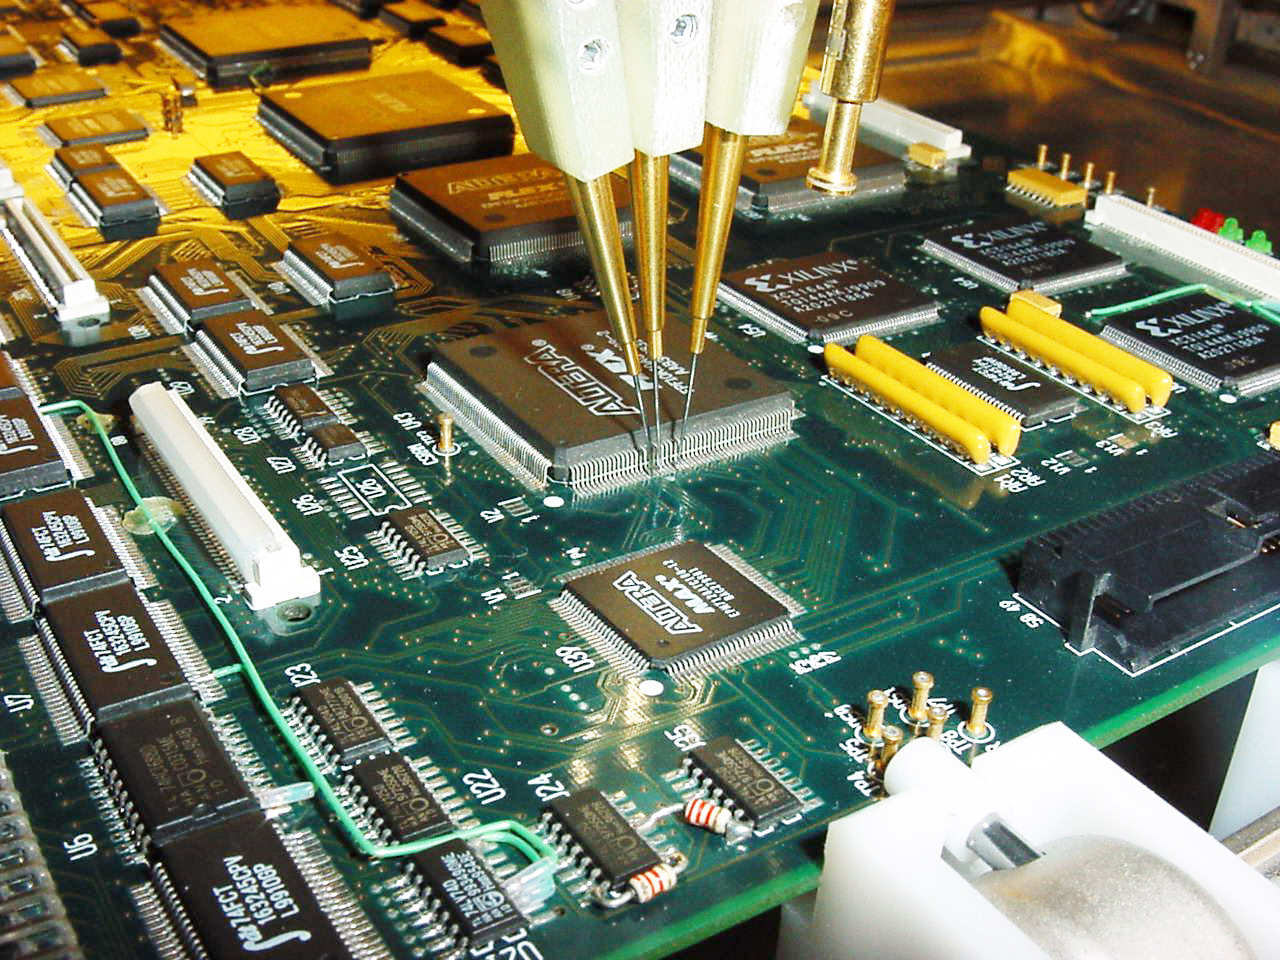 Https Inaktiv Broadcom Ca Kuendigt Kontakt Pcc Printed Circuit Board Cleaning Spray Esd Shop Ic Kontaktierung Contacting